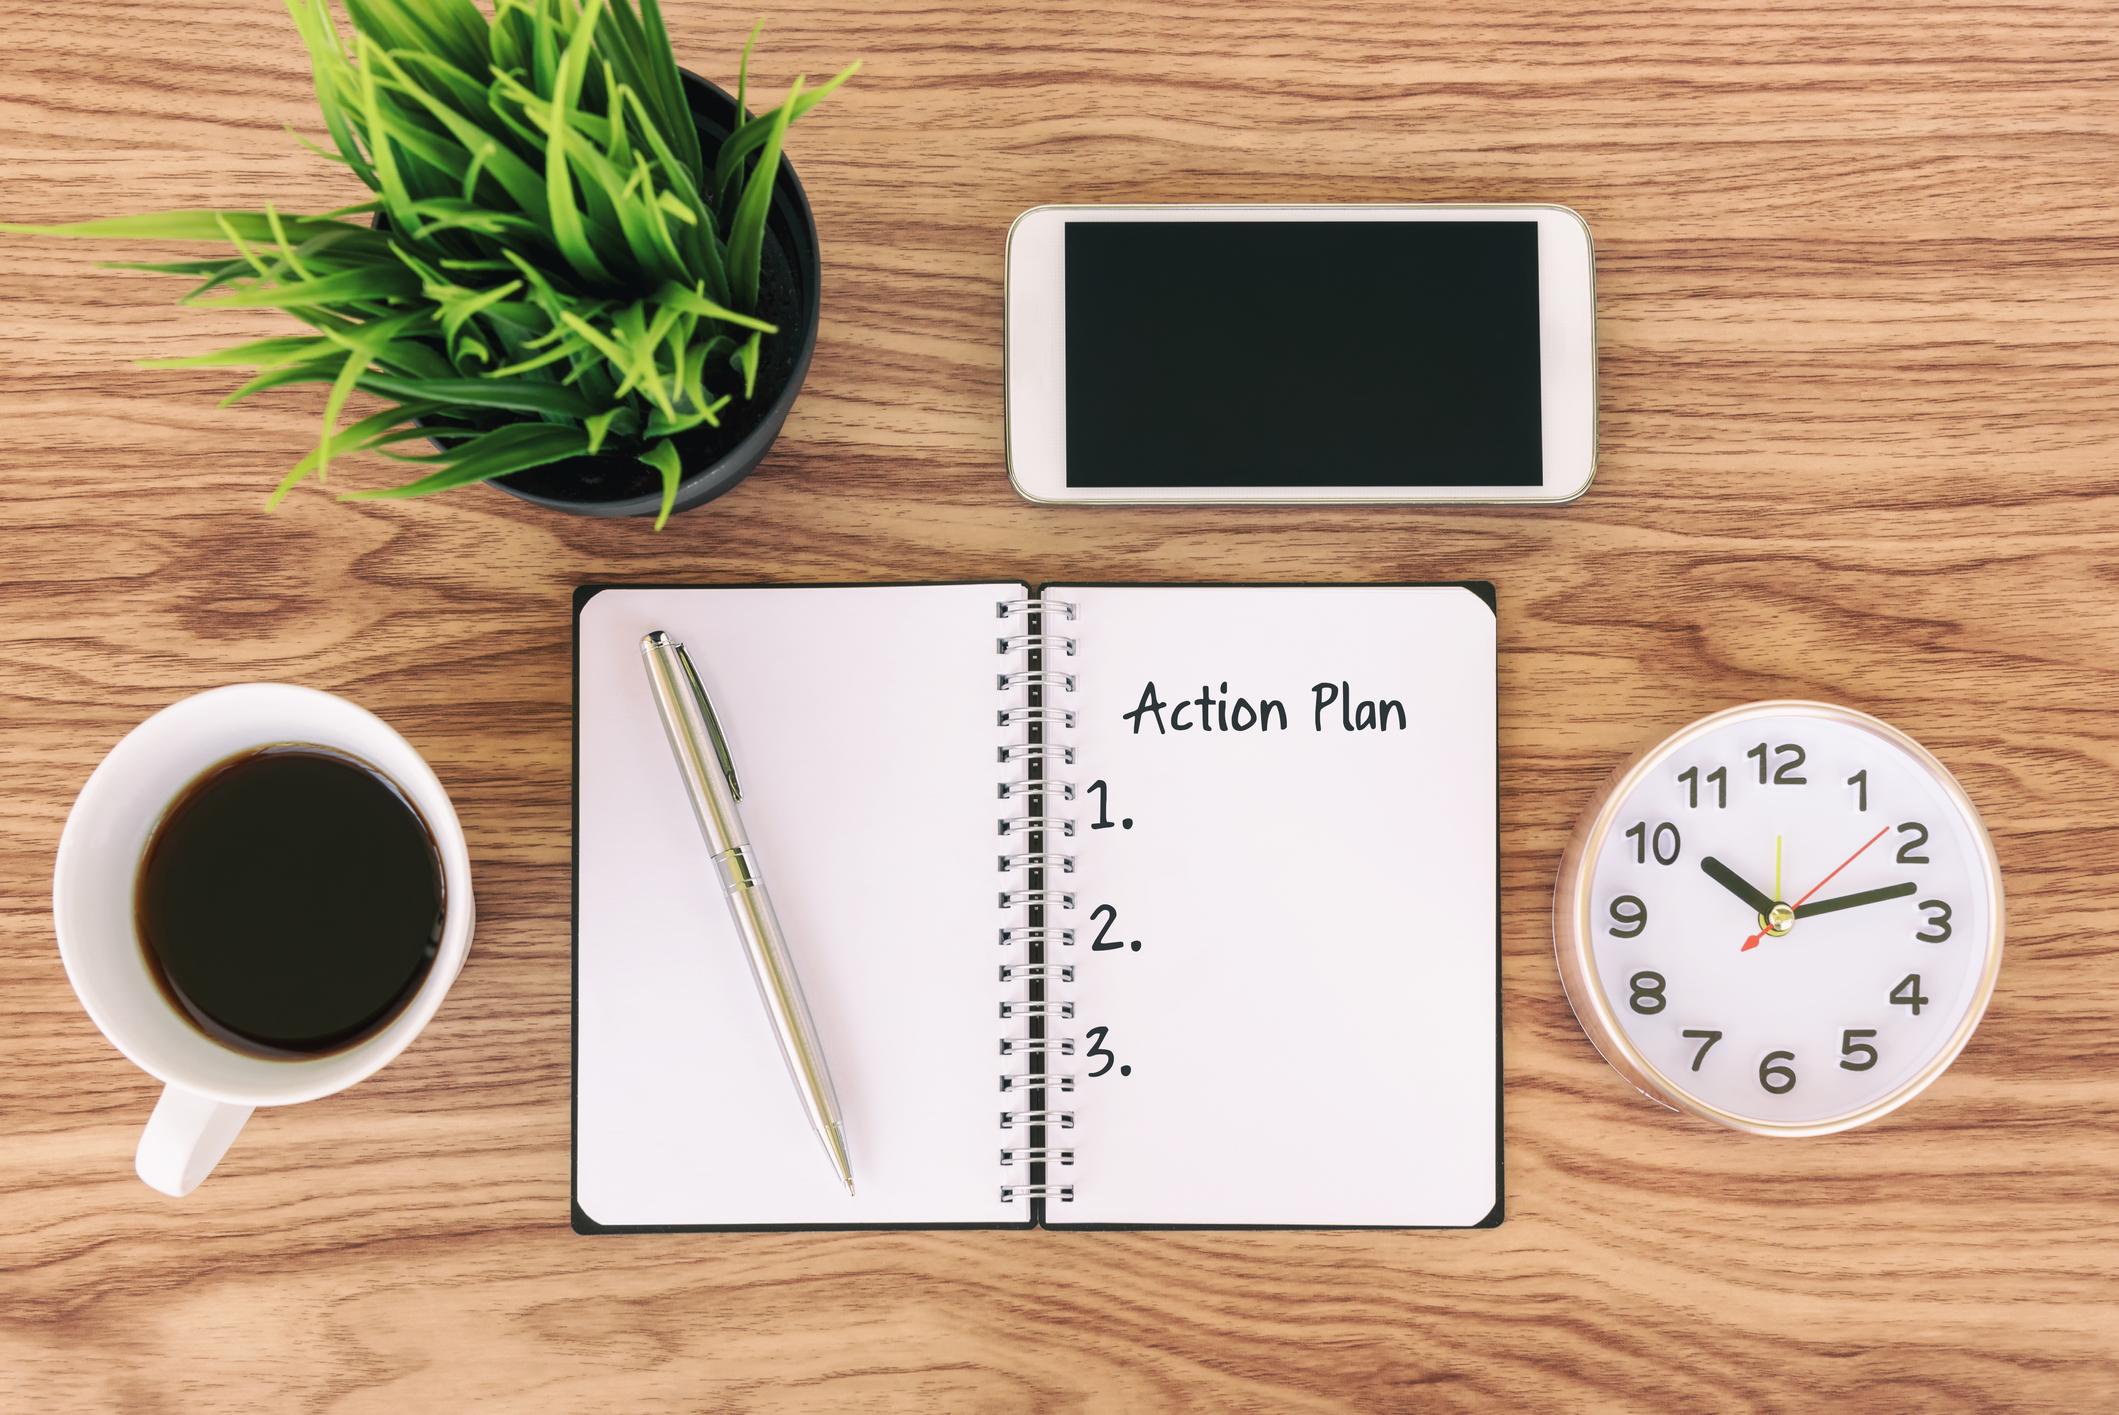 Action Plan List